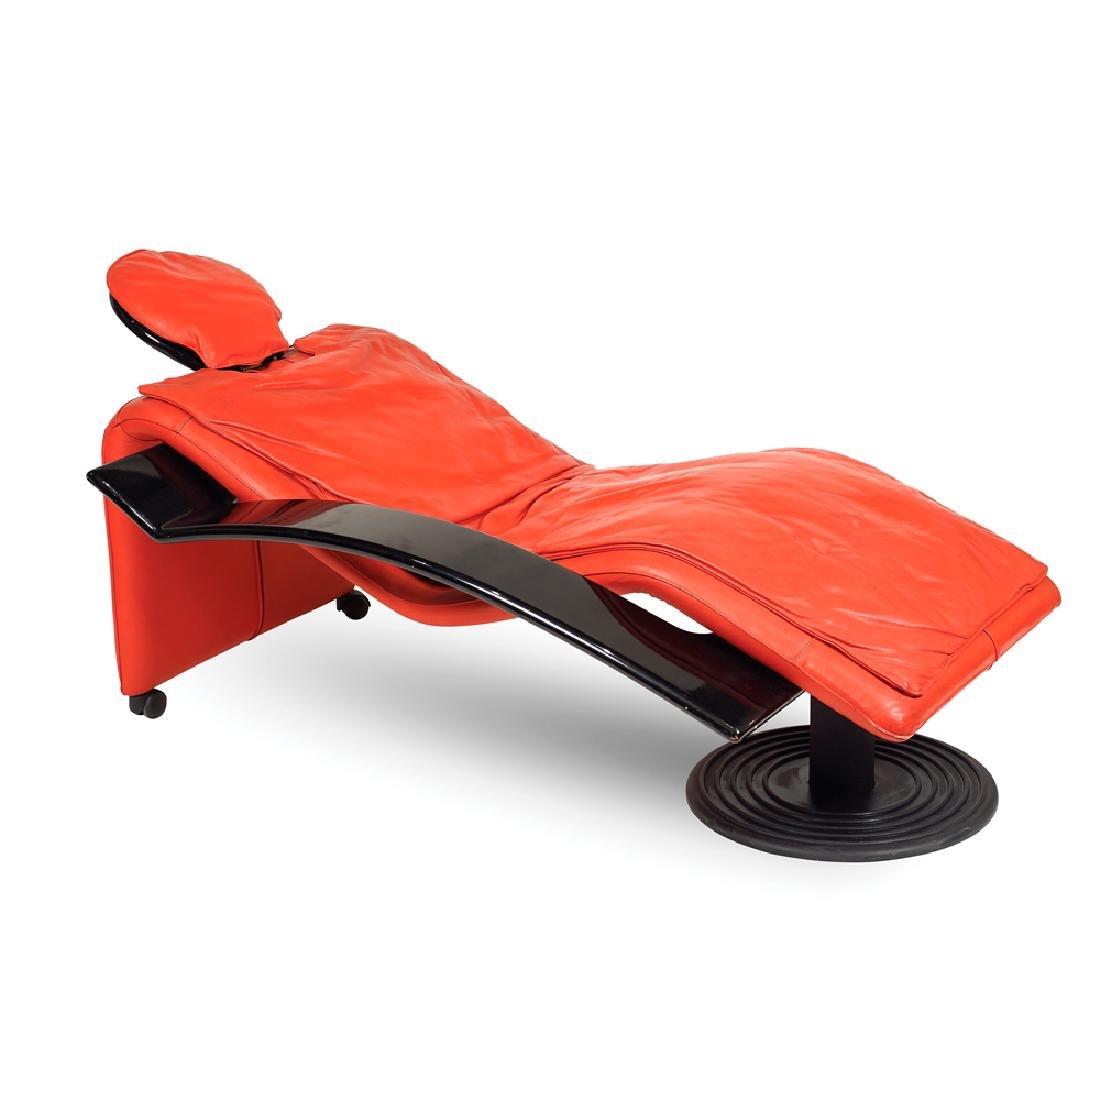 Chaise longue design 20th century 90x155x80 cm.